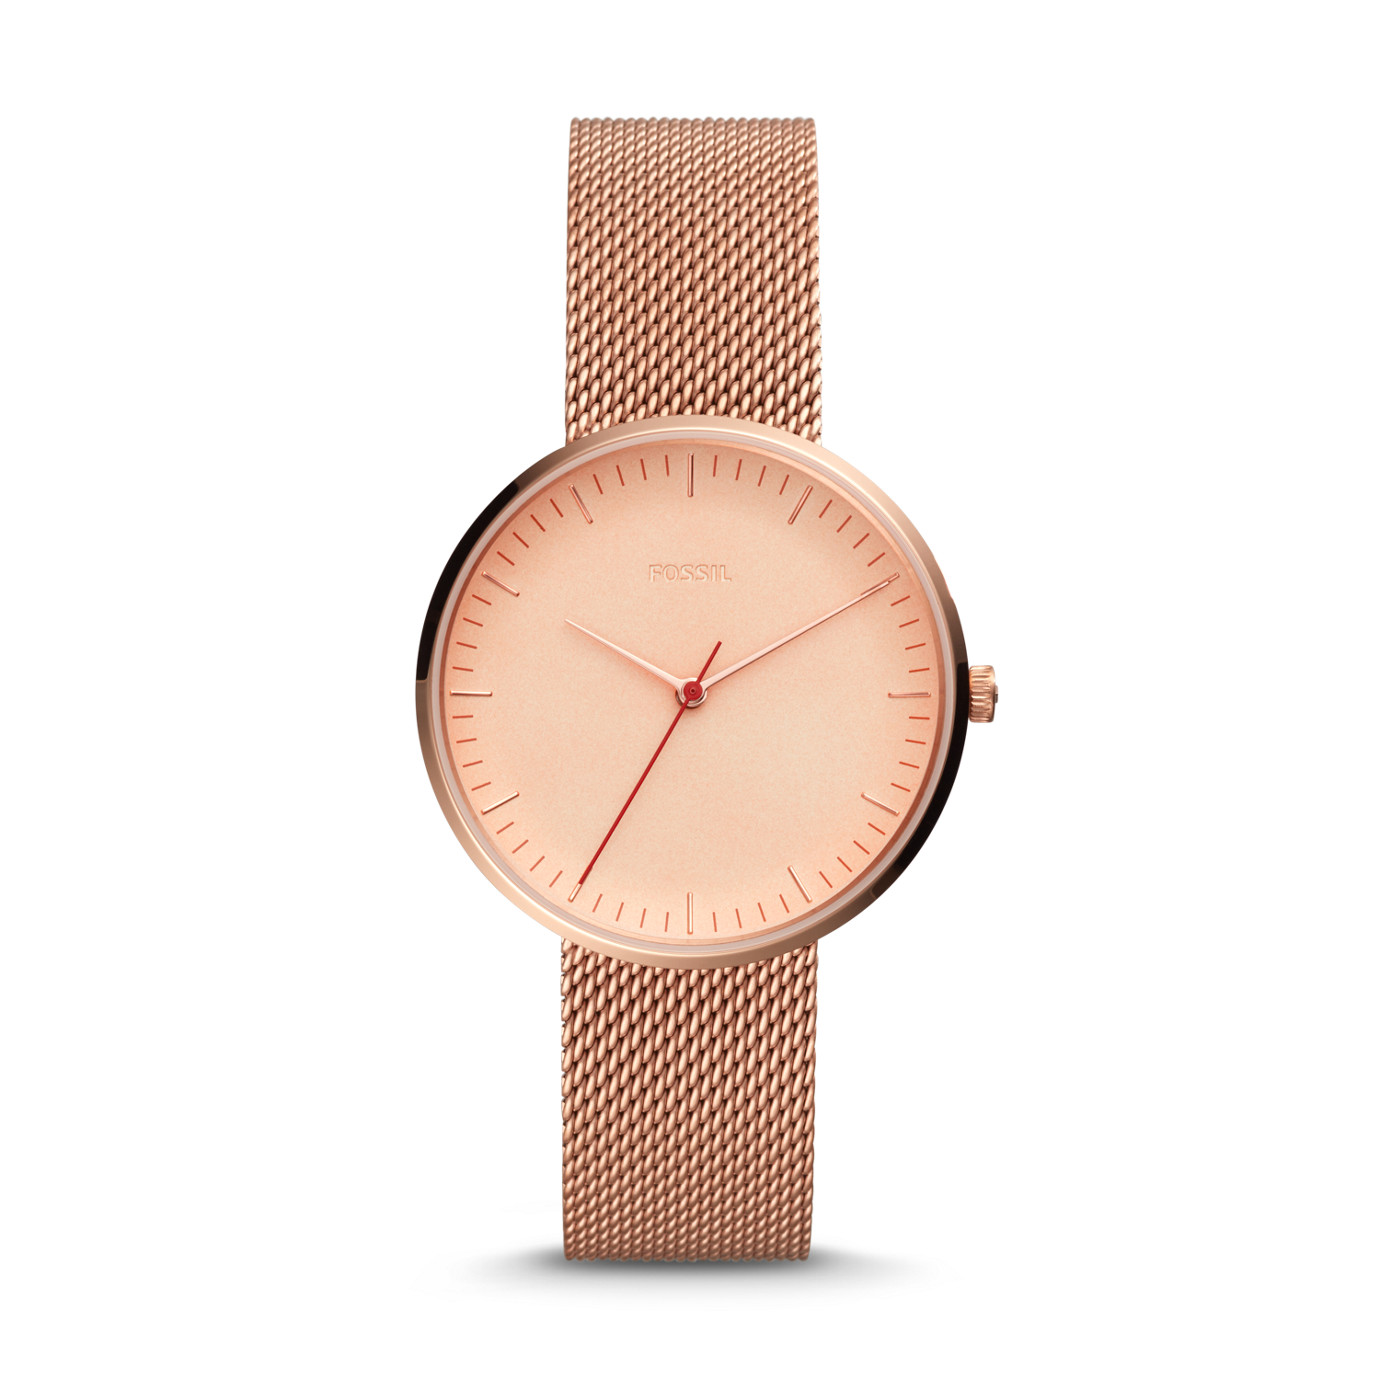 Essentialist 系列三指針玫瑰金色不鏽鋼手錶